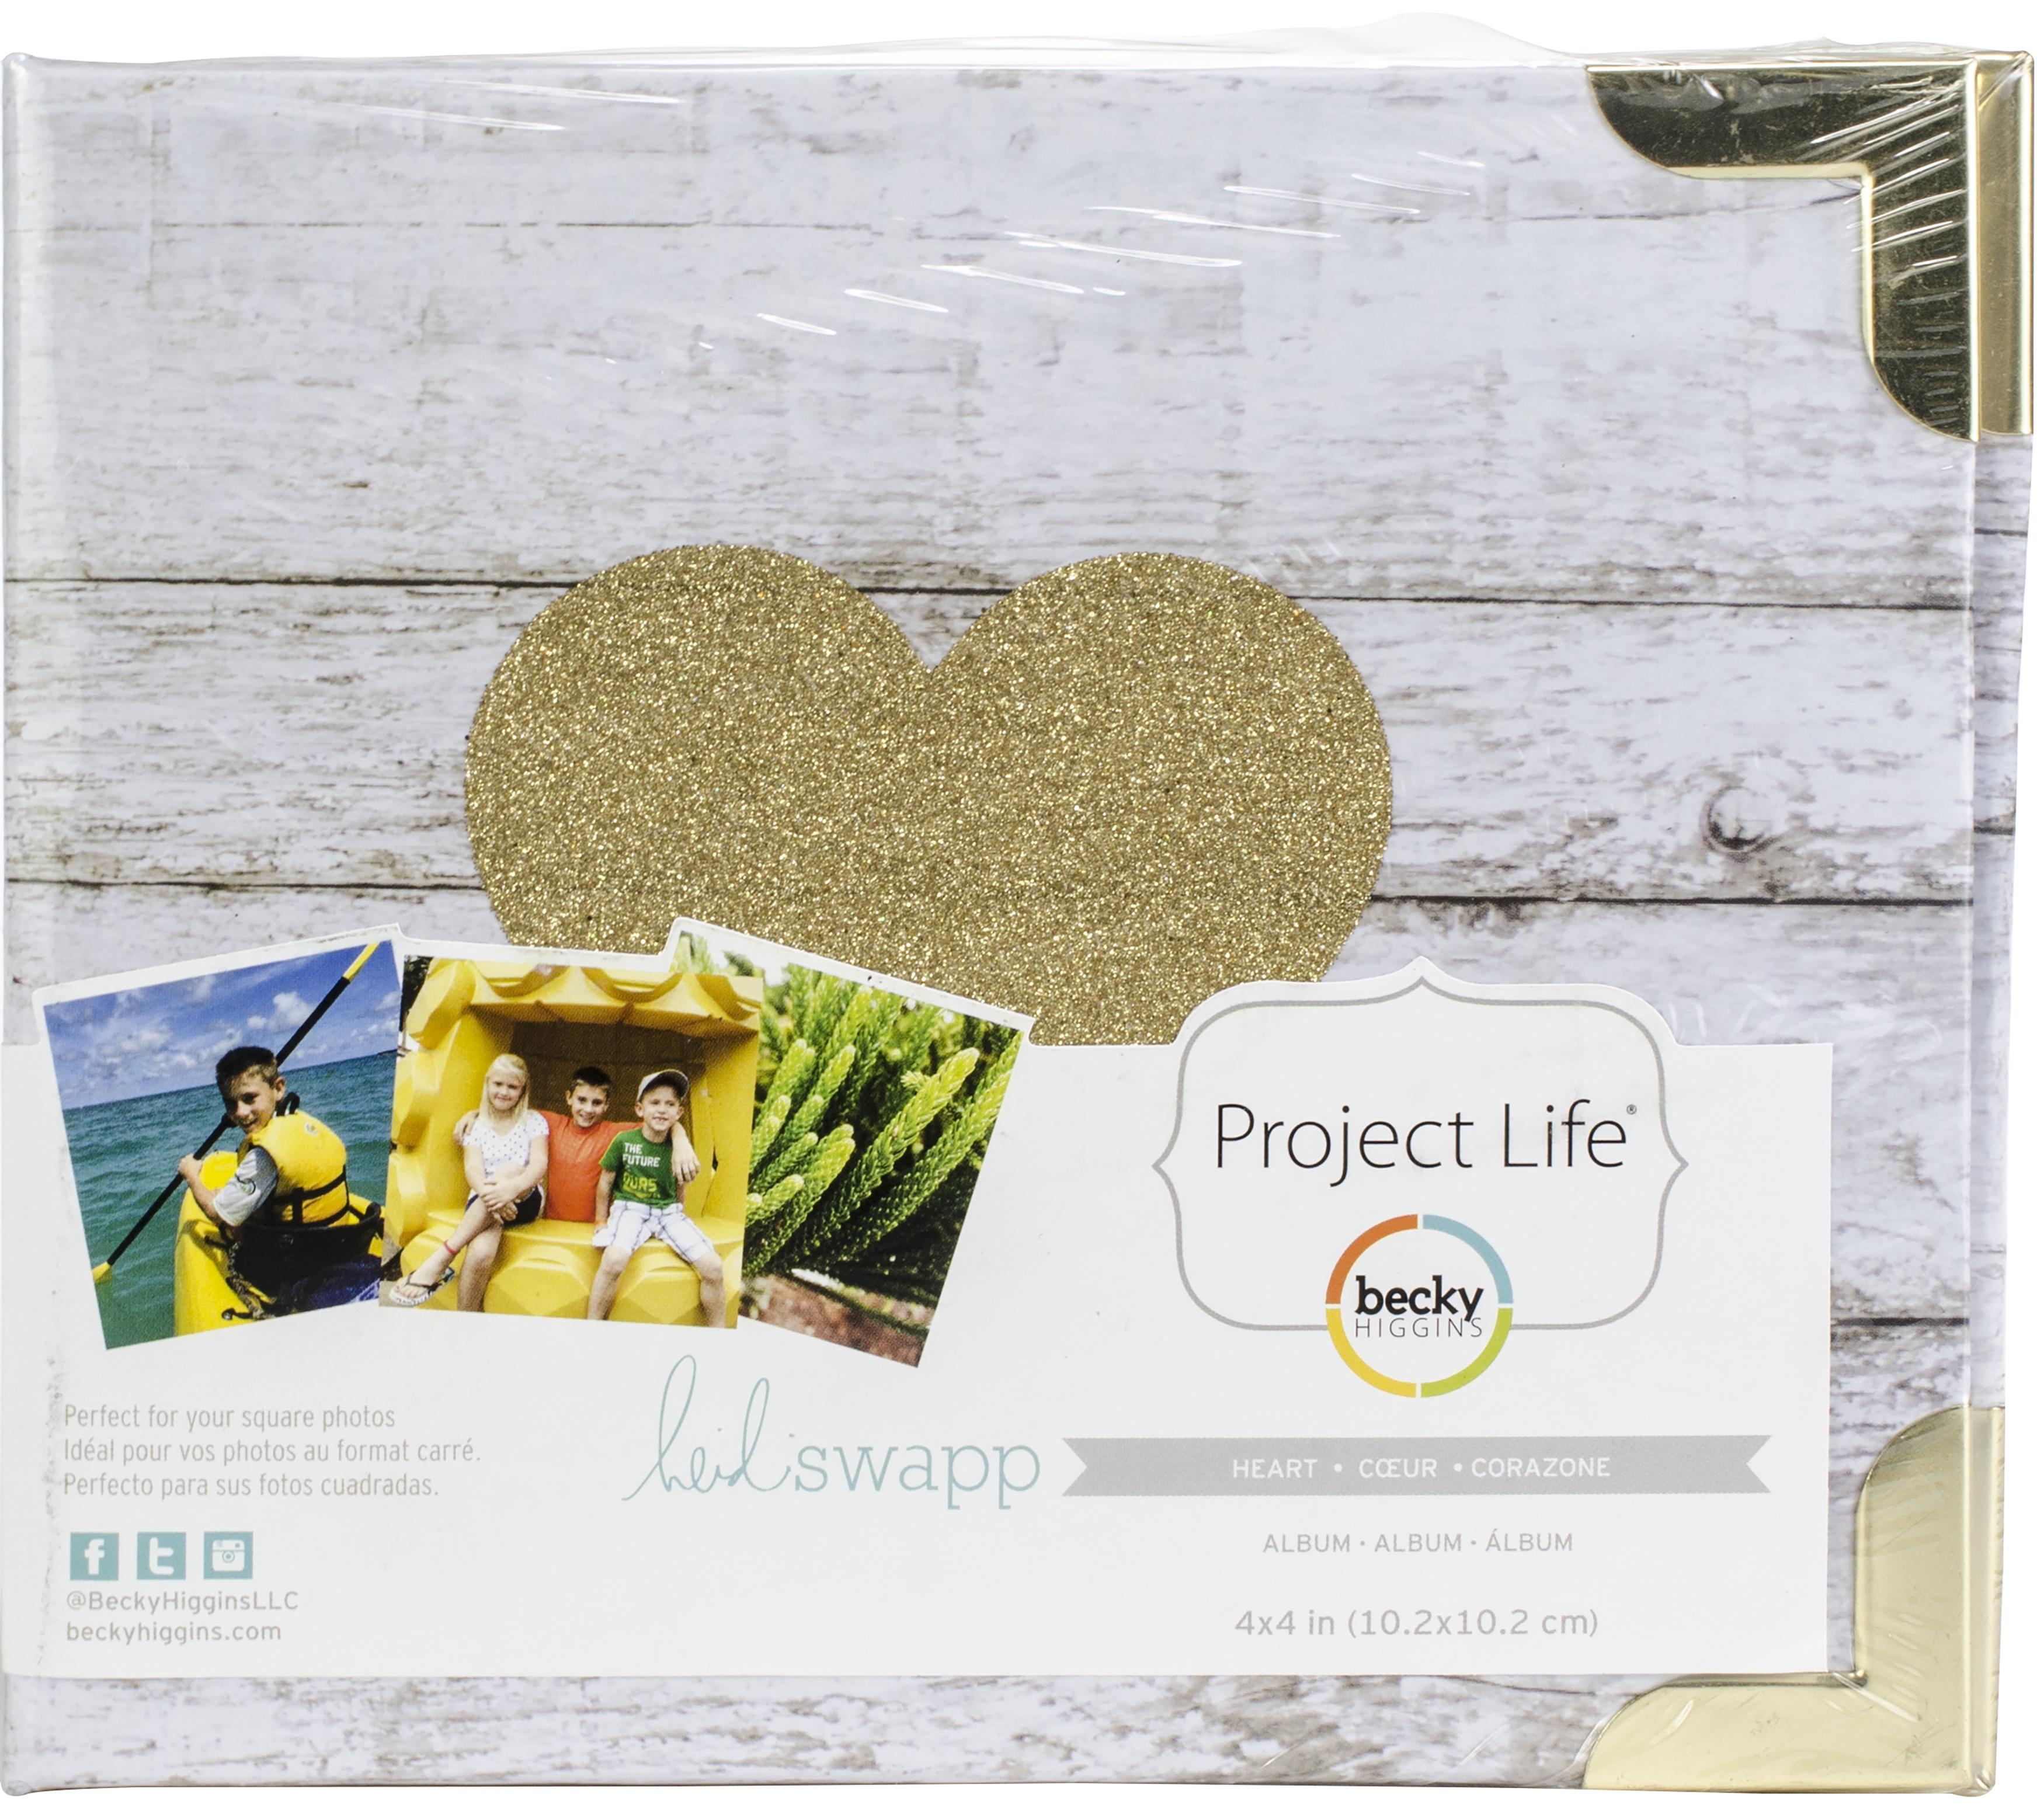 AC - Project Life D-Ring Album - Glitter Heart 4X4